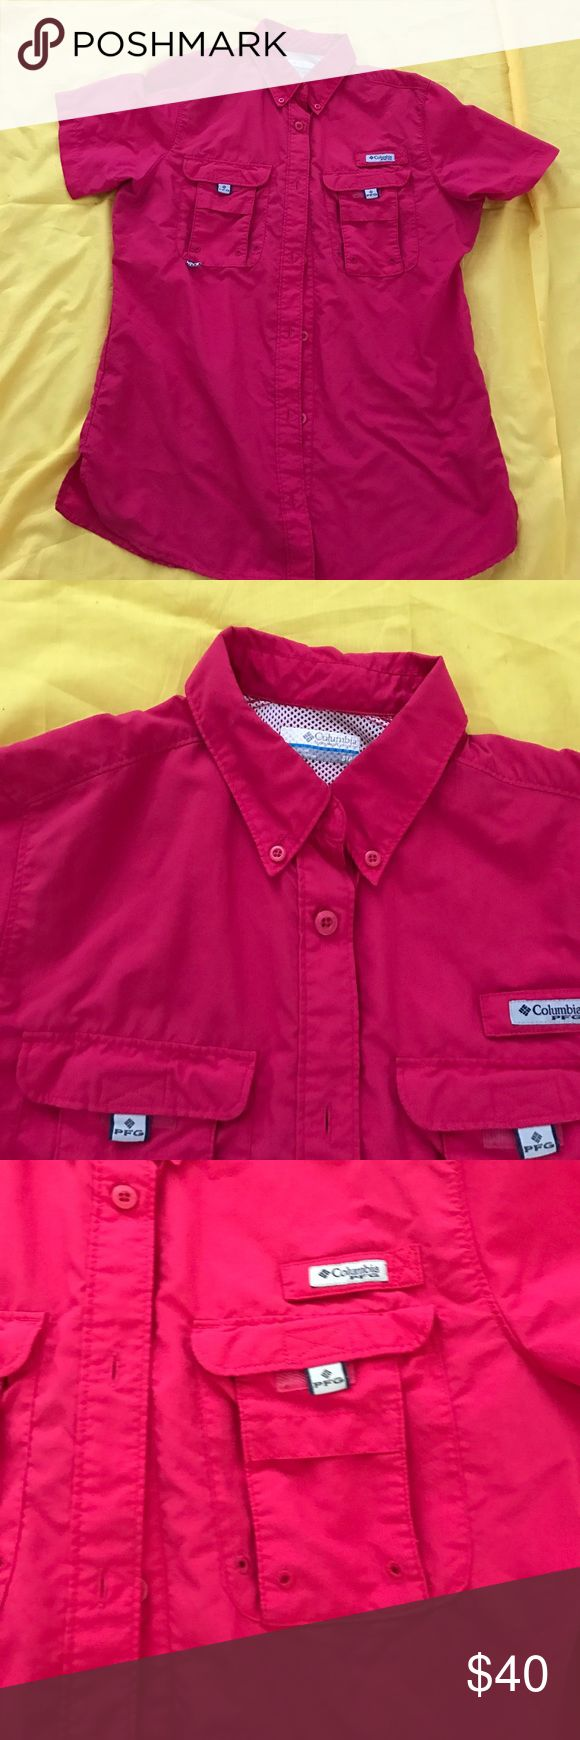 Hot pink Columbia fishing shirt Hot pink Columbia fishing shirt small Columbia Other